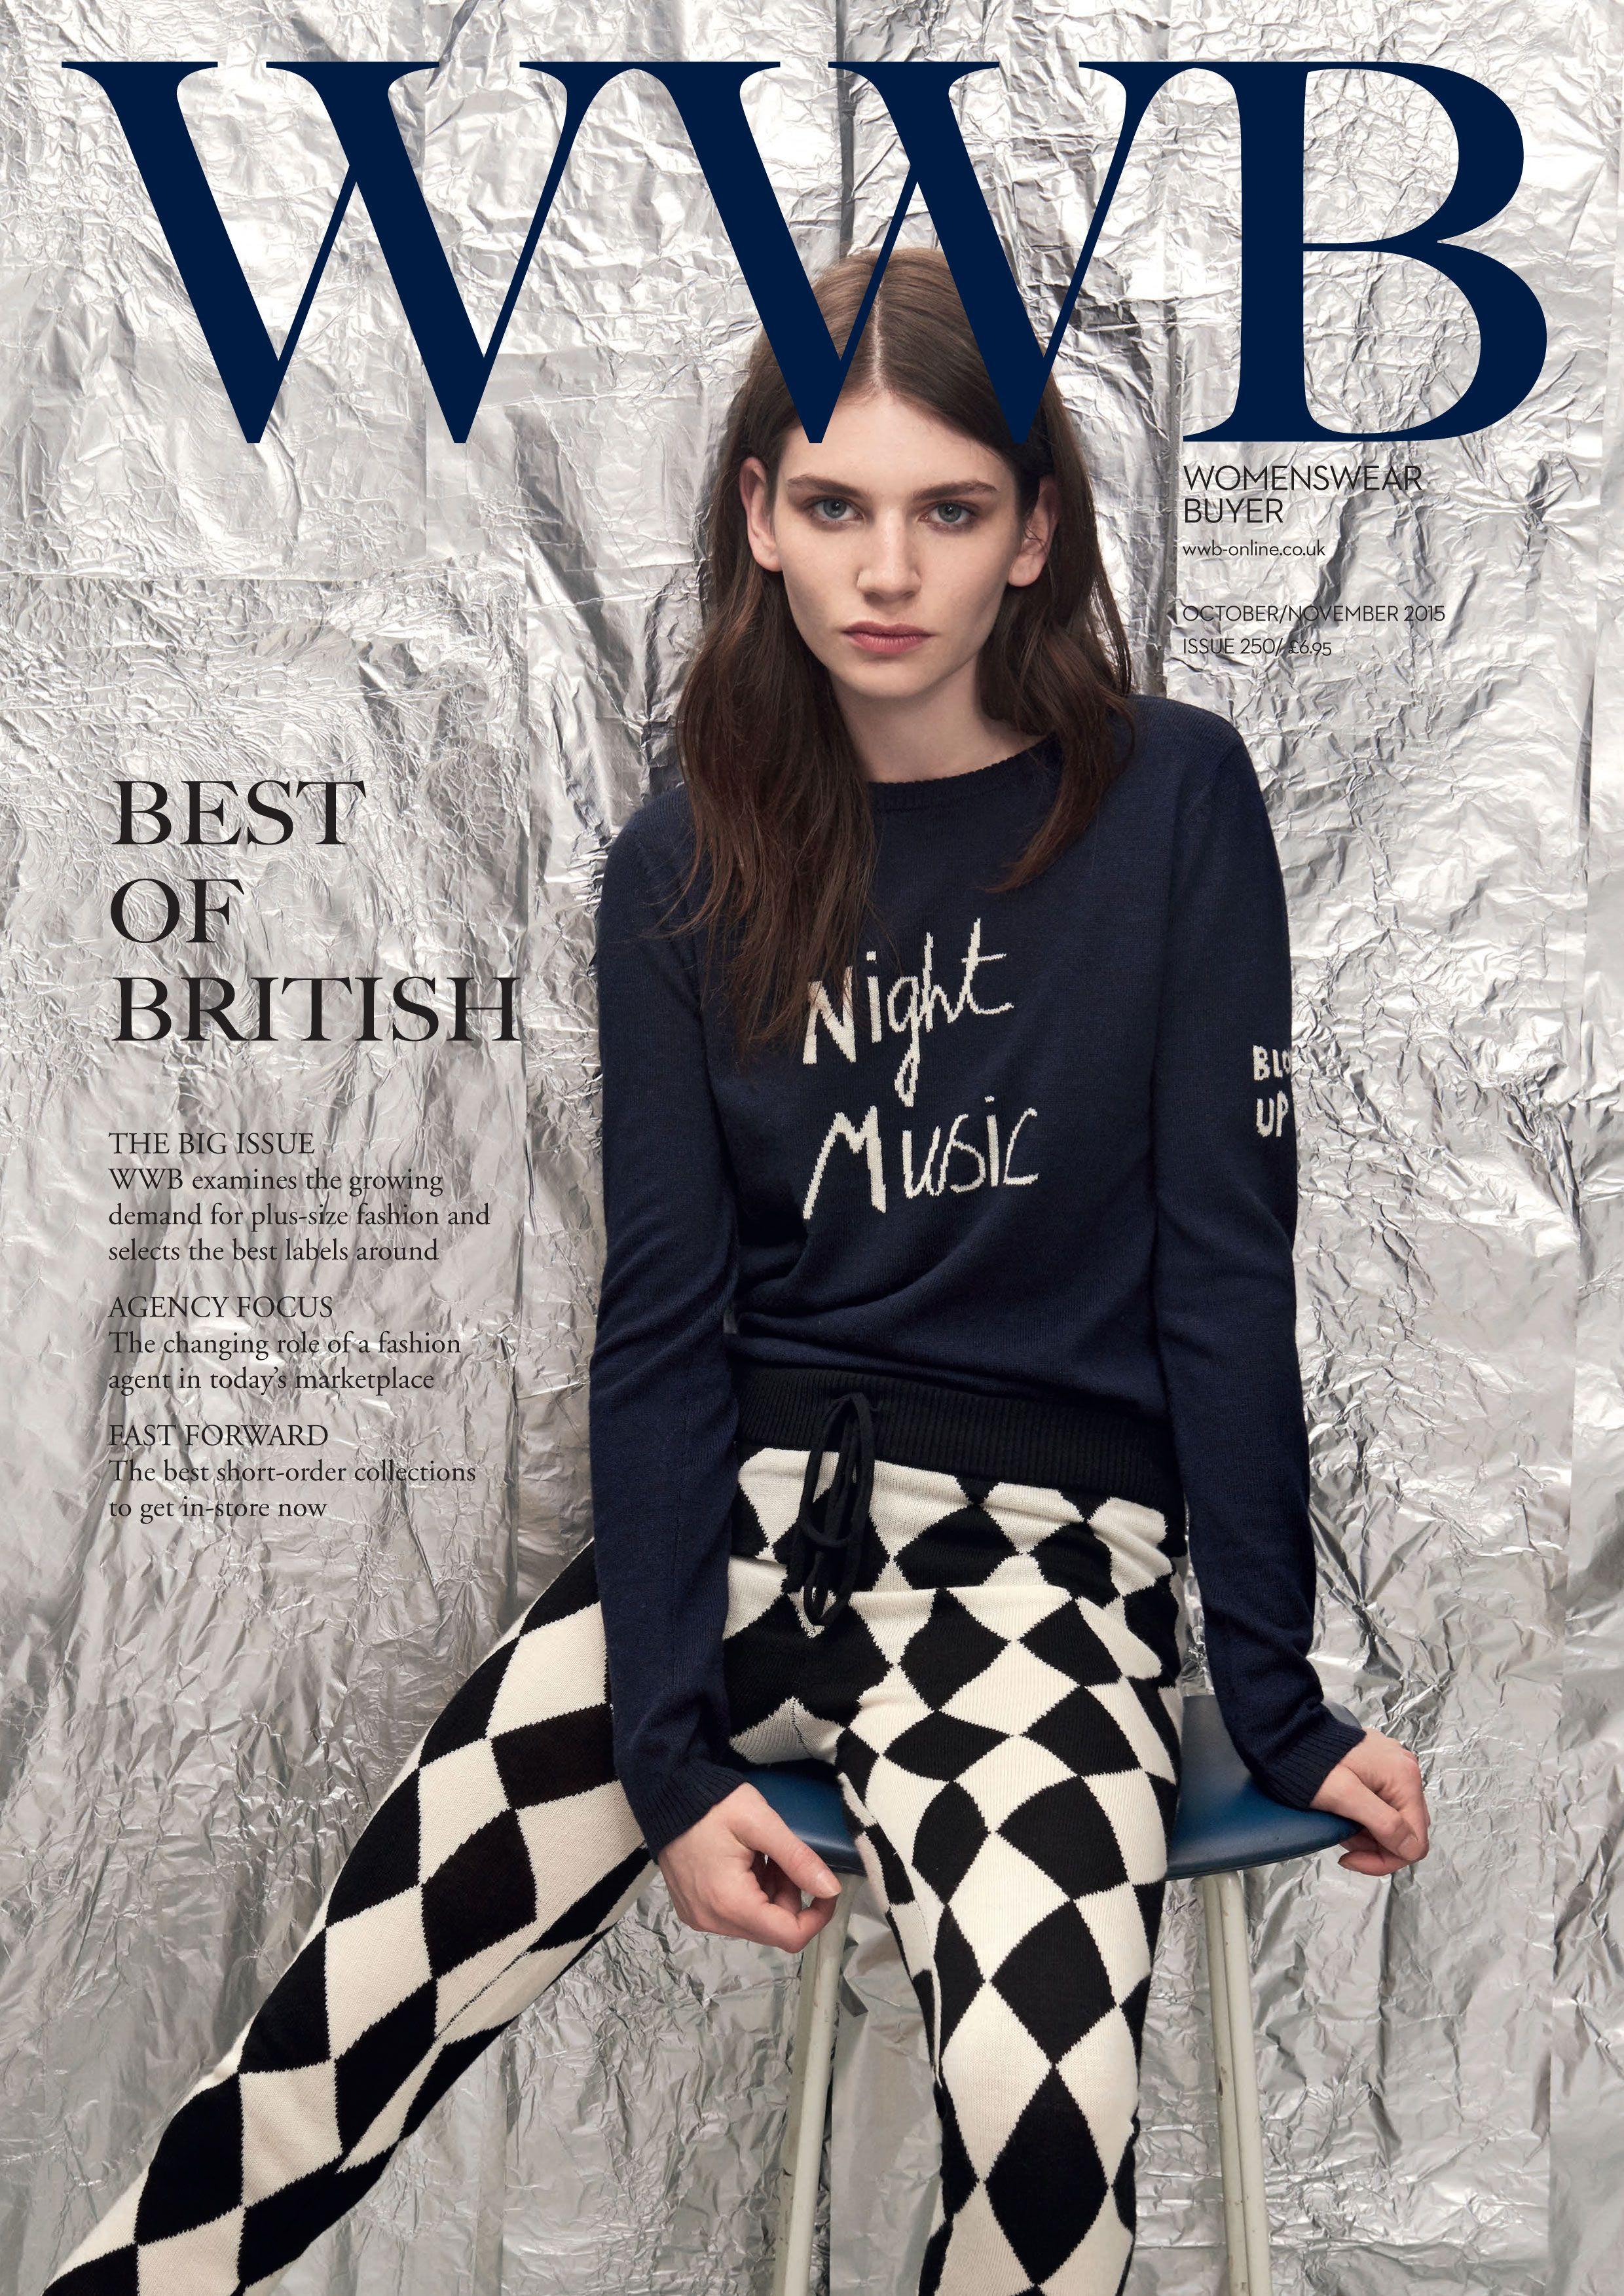 Pin by WWB Magazine on COVERS East fashion, Uk fashion